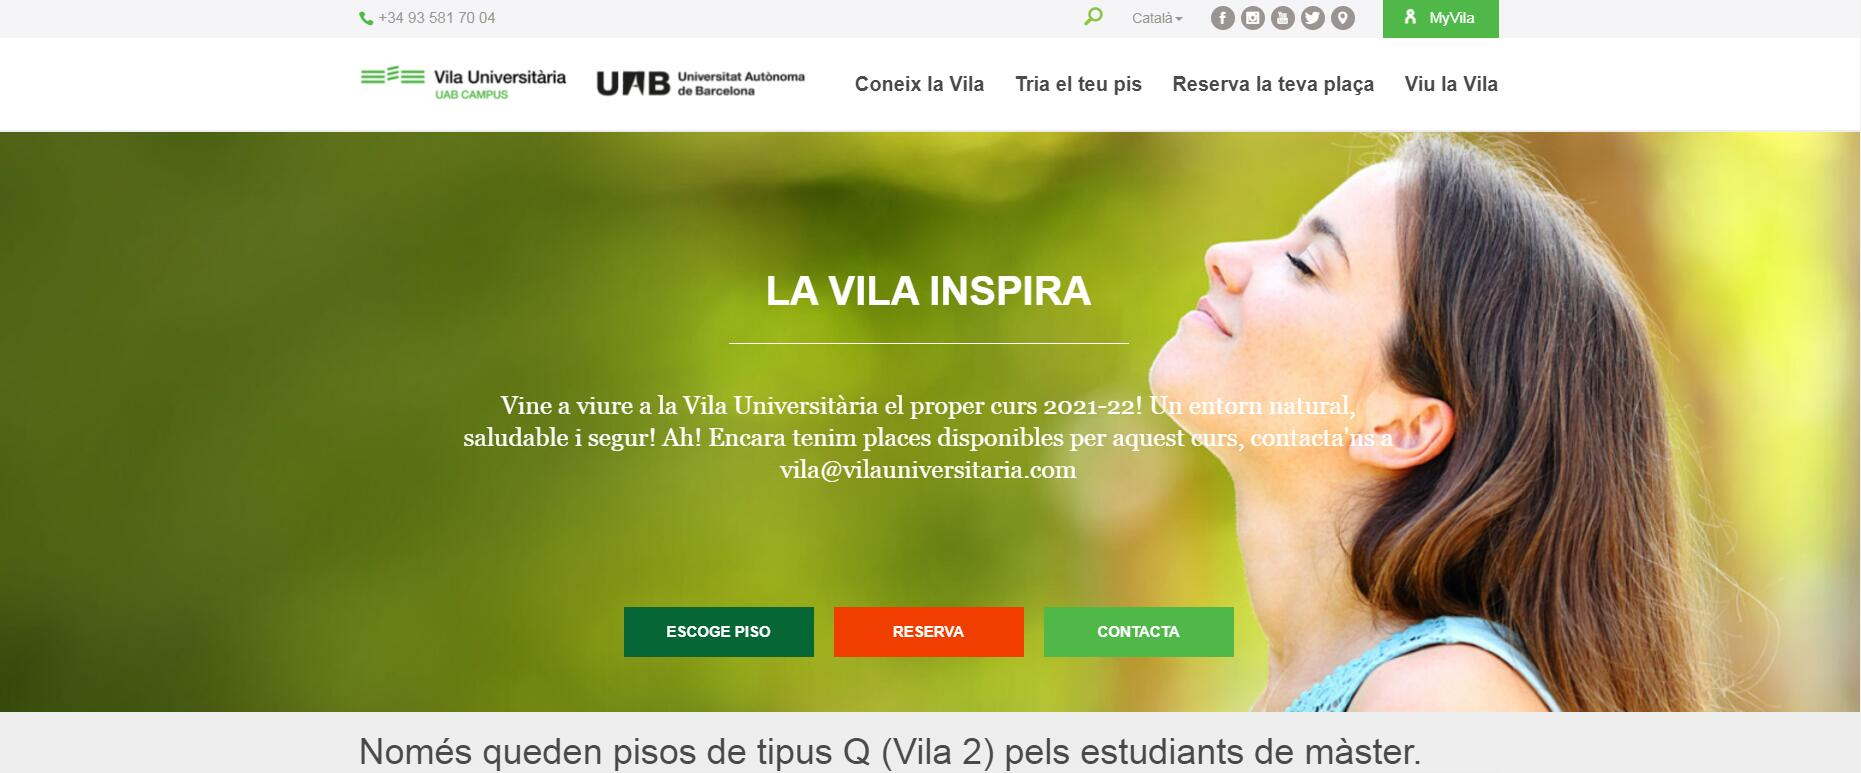 Vila Universitària Universitat Autònoma de Barcelona